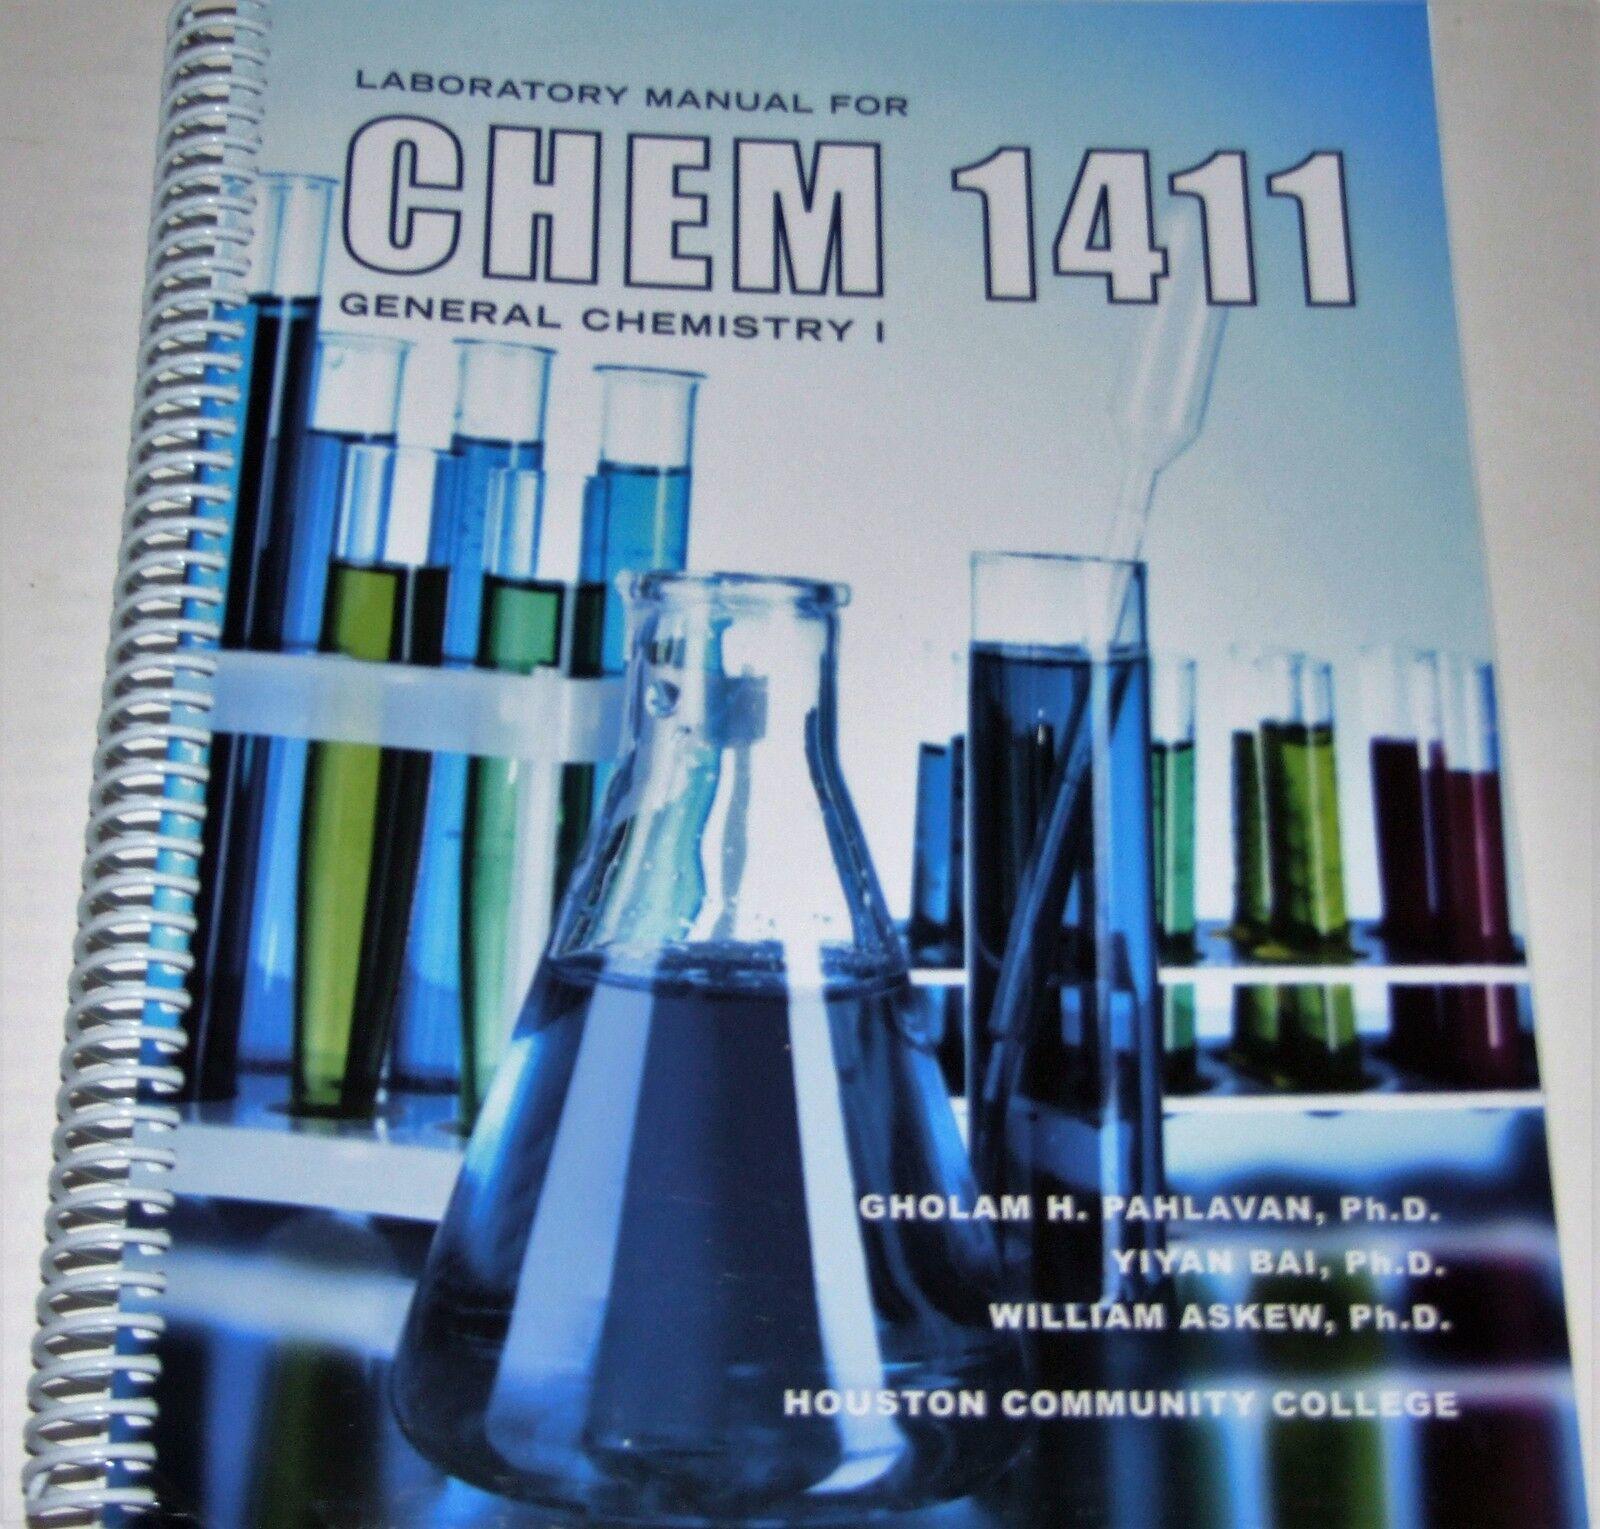 Laboratory Manual for Chem 1411 General Chemistry 1 | eBay